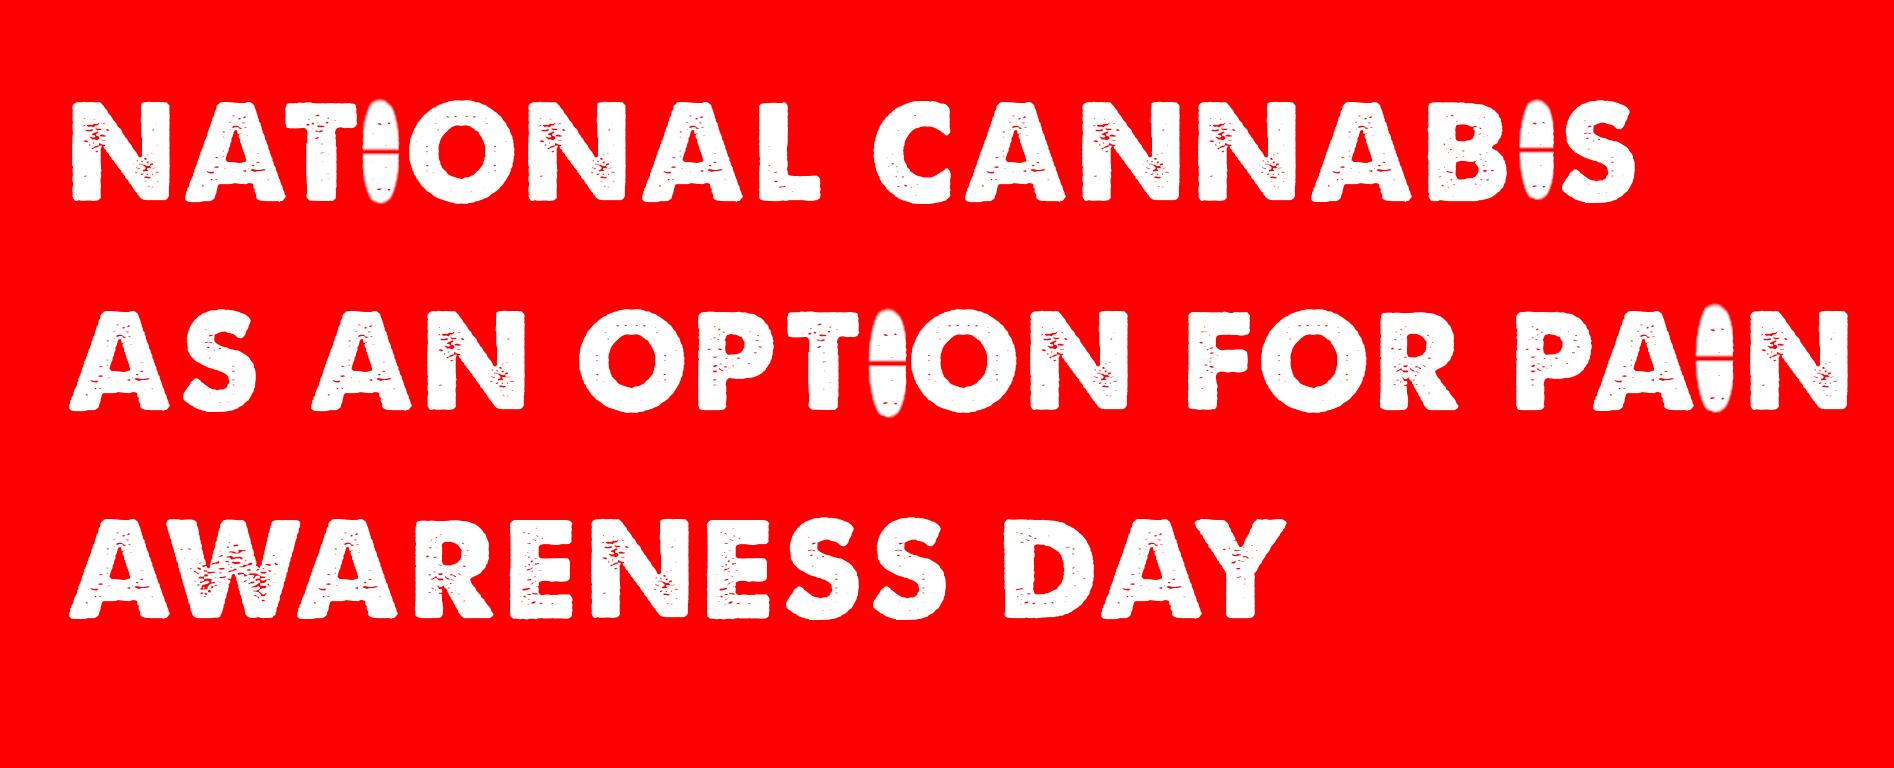 National_Awareness_Day.png